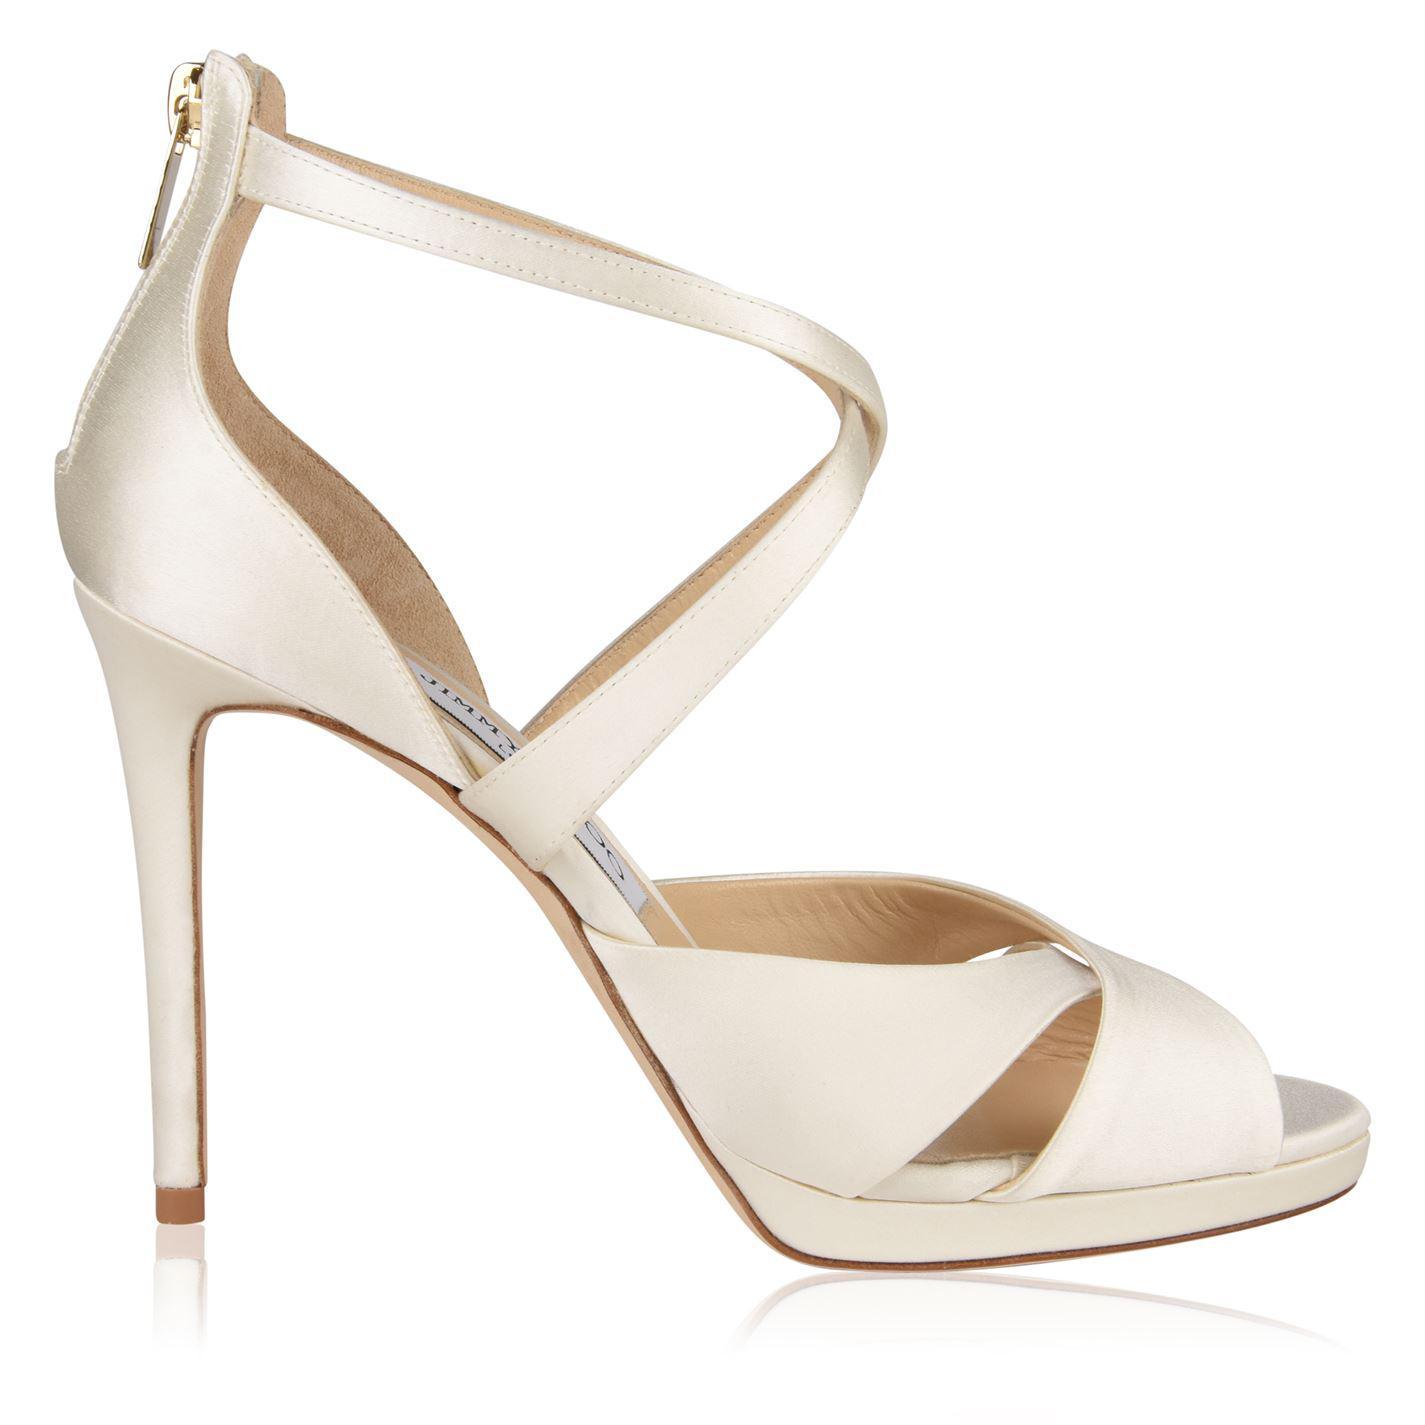 193afd4a2e8 Lyst - Jimmy Choo Lorina 100 Heeled Sandals in White